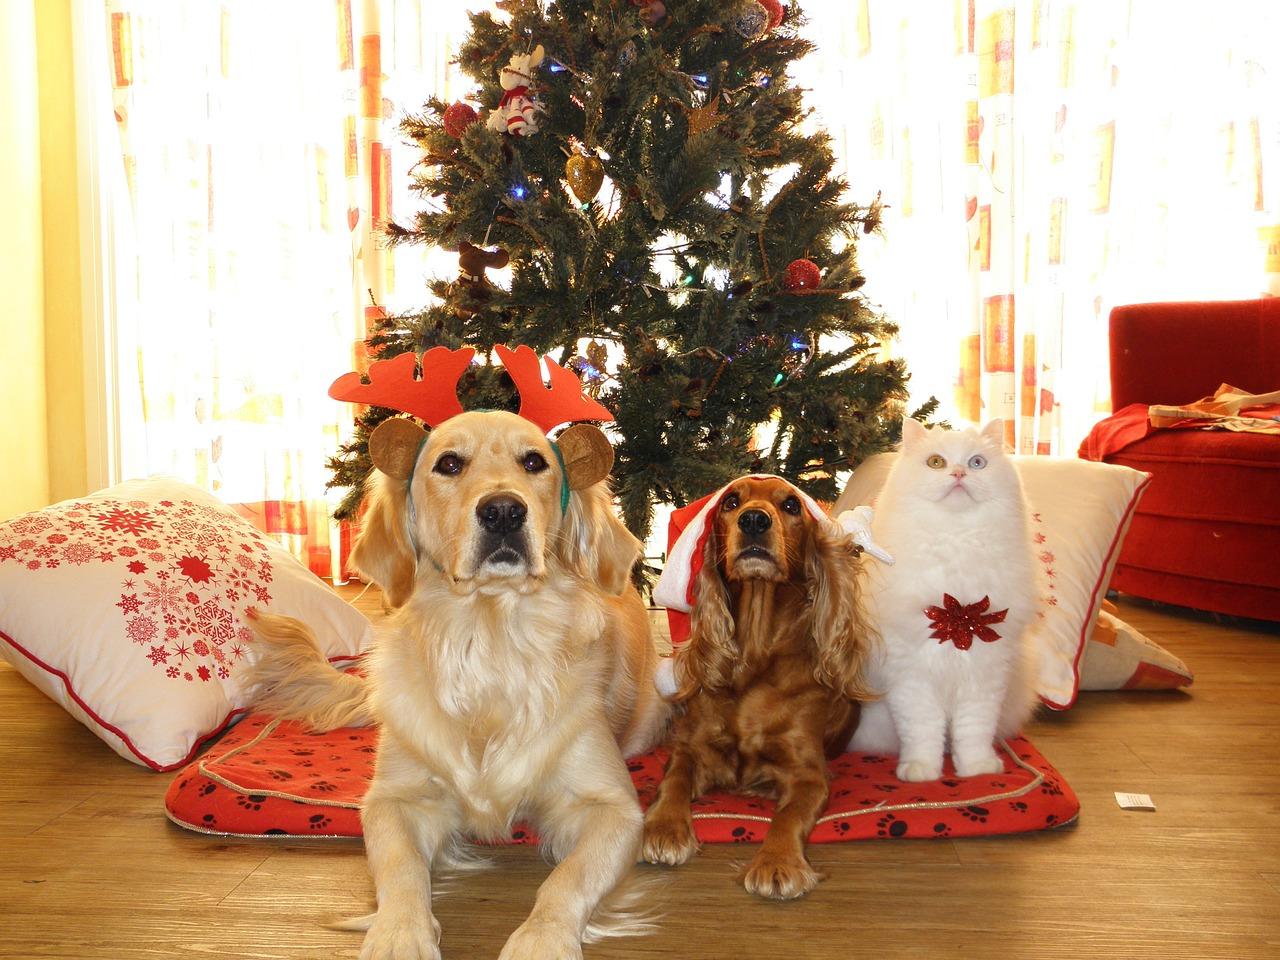 pet cat dog christmas Critter Caretakers Pet Services Christmas Lists: Dog vs. Cat